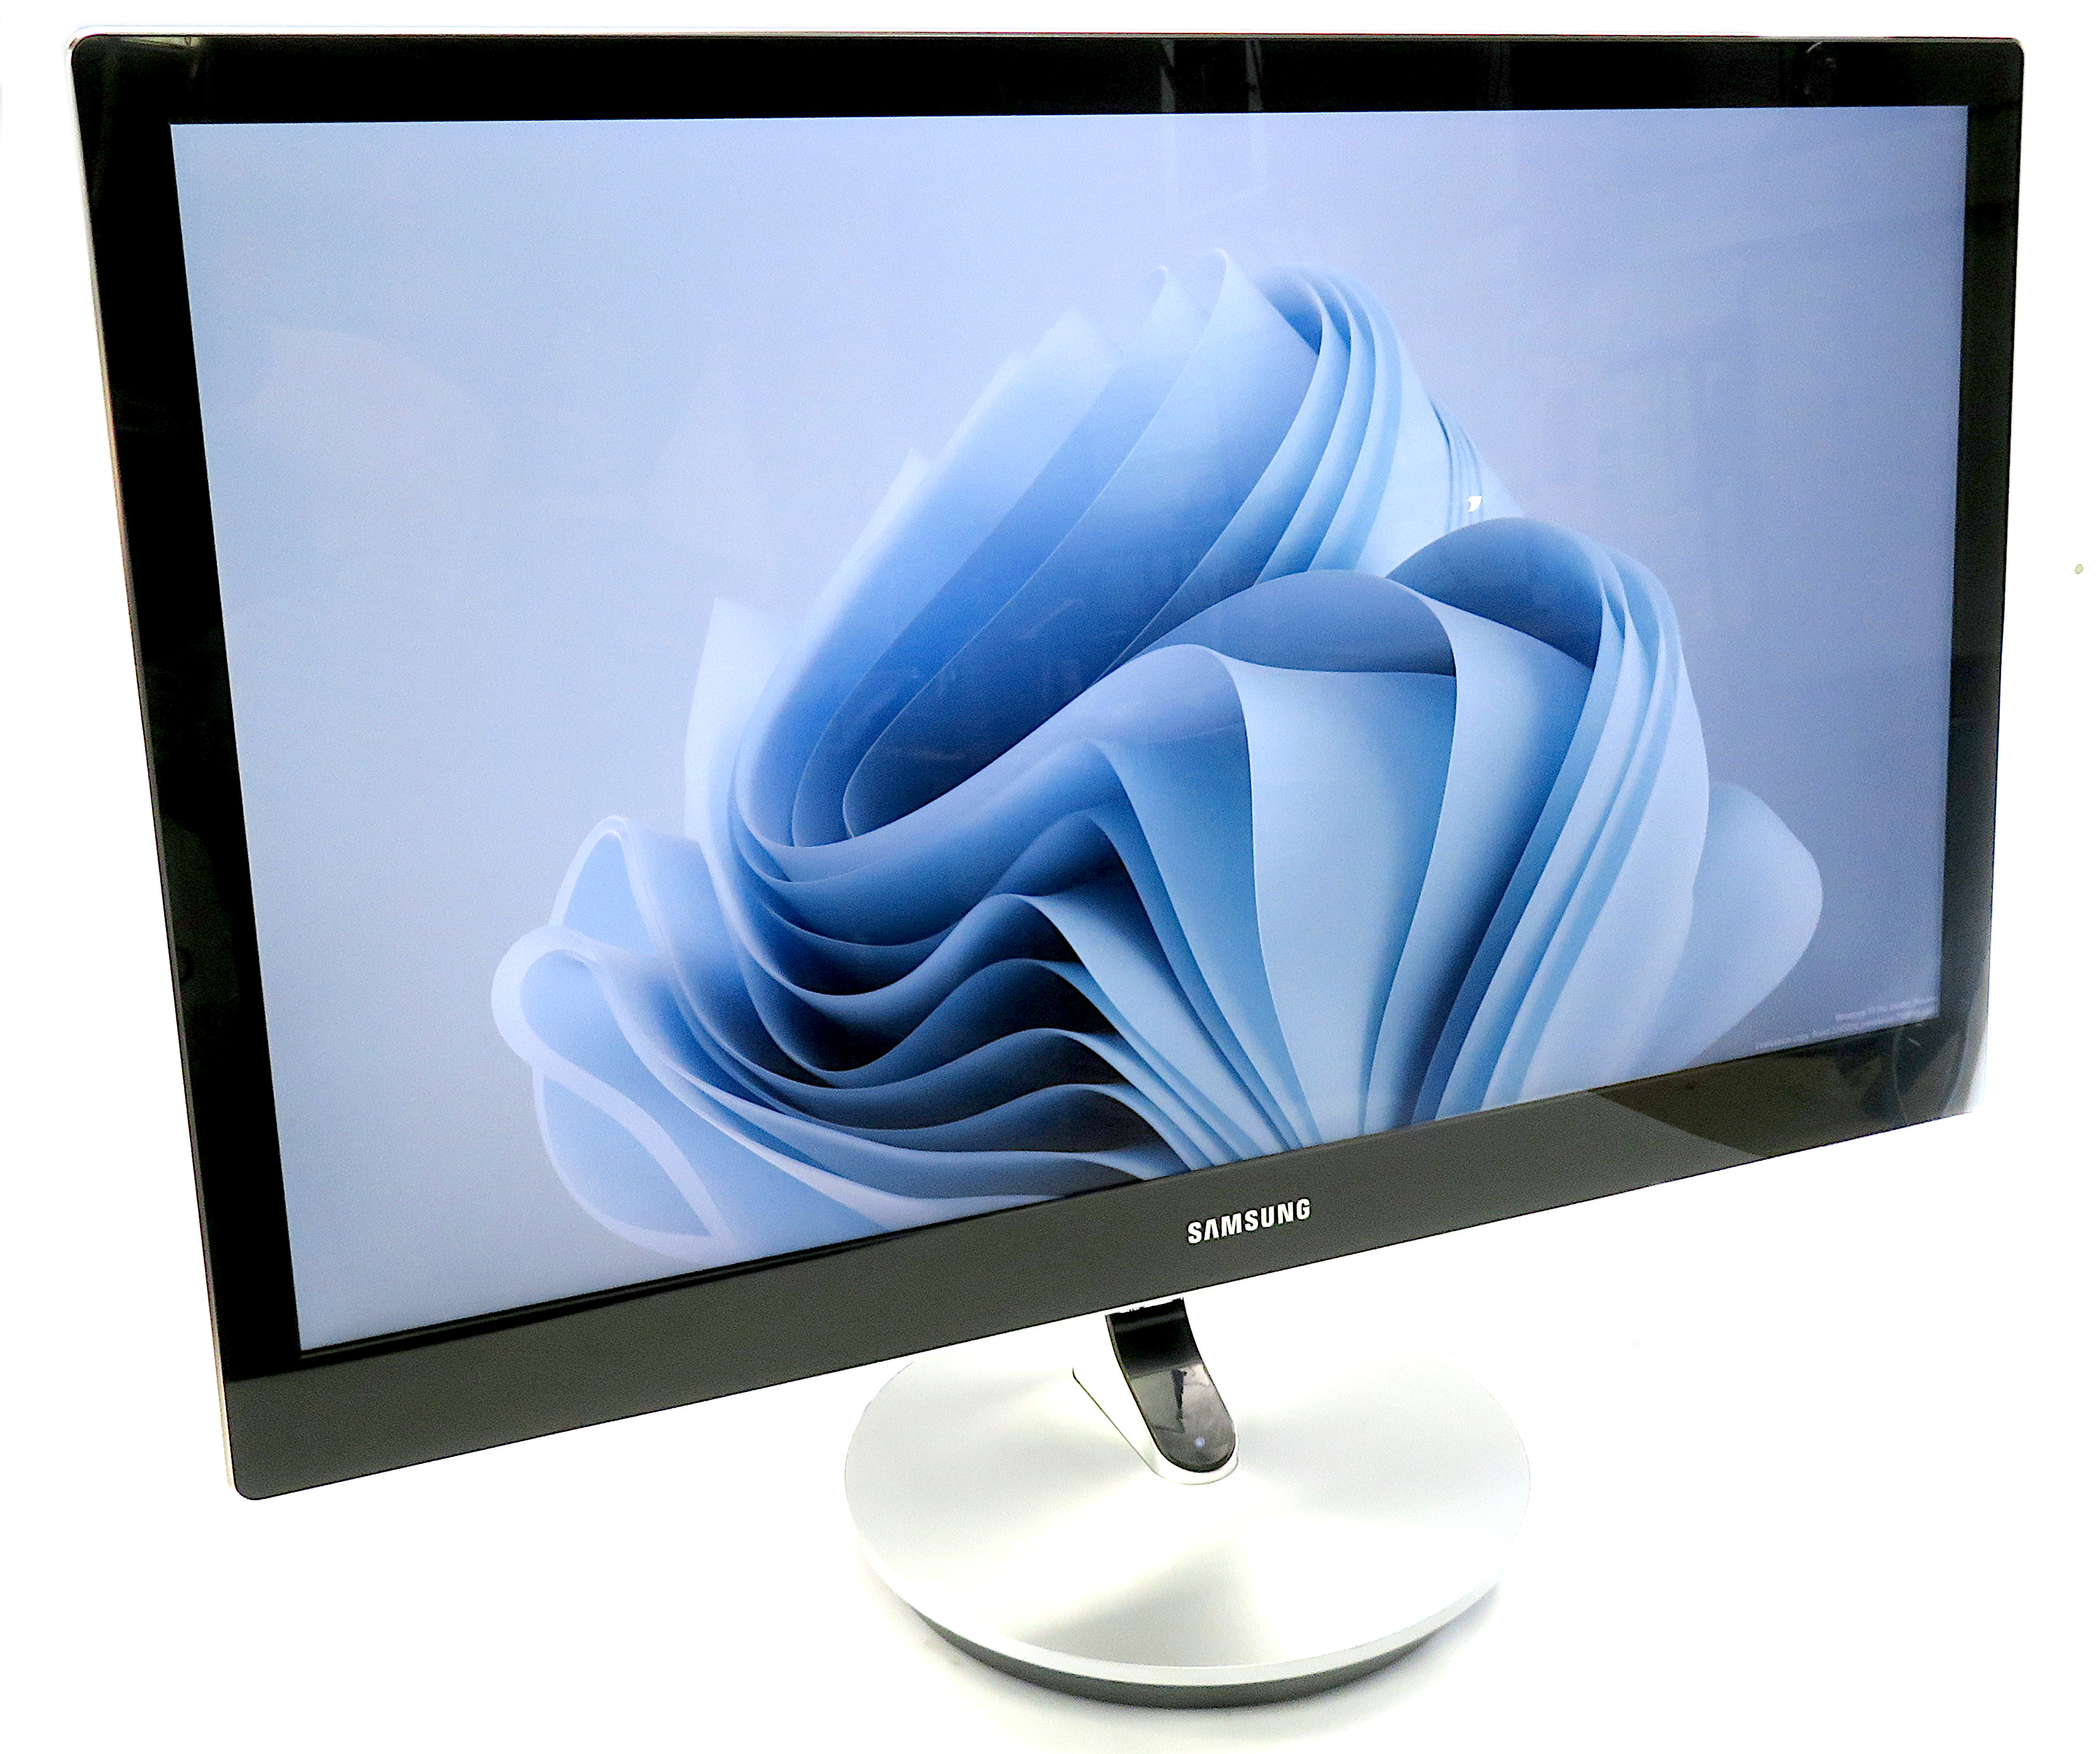 "Samsung S27B970D 27"" WQHD (2560x1440 16:9) PLS LED Monitor DP/HDMI/DVI"